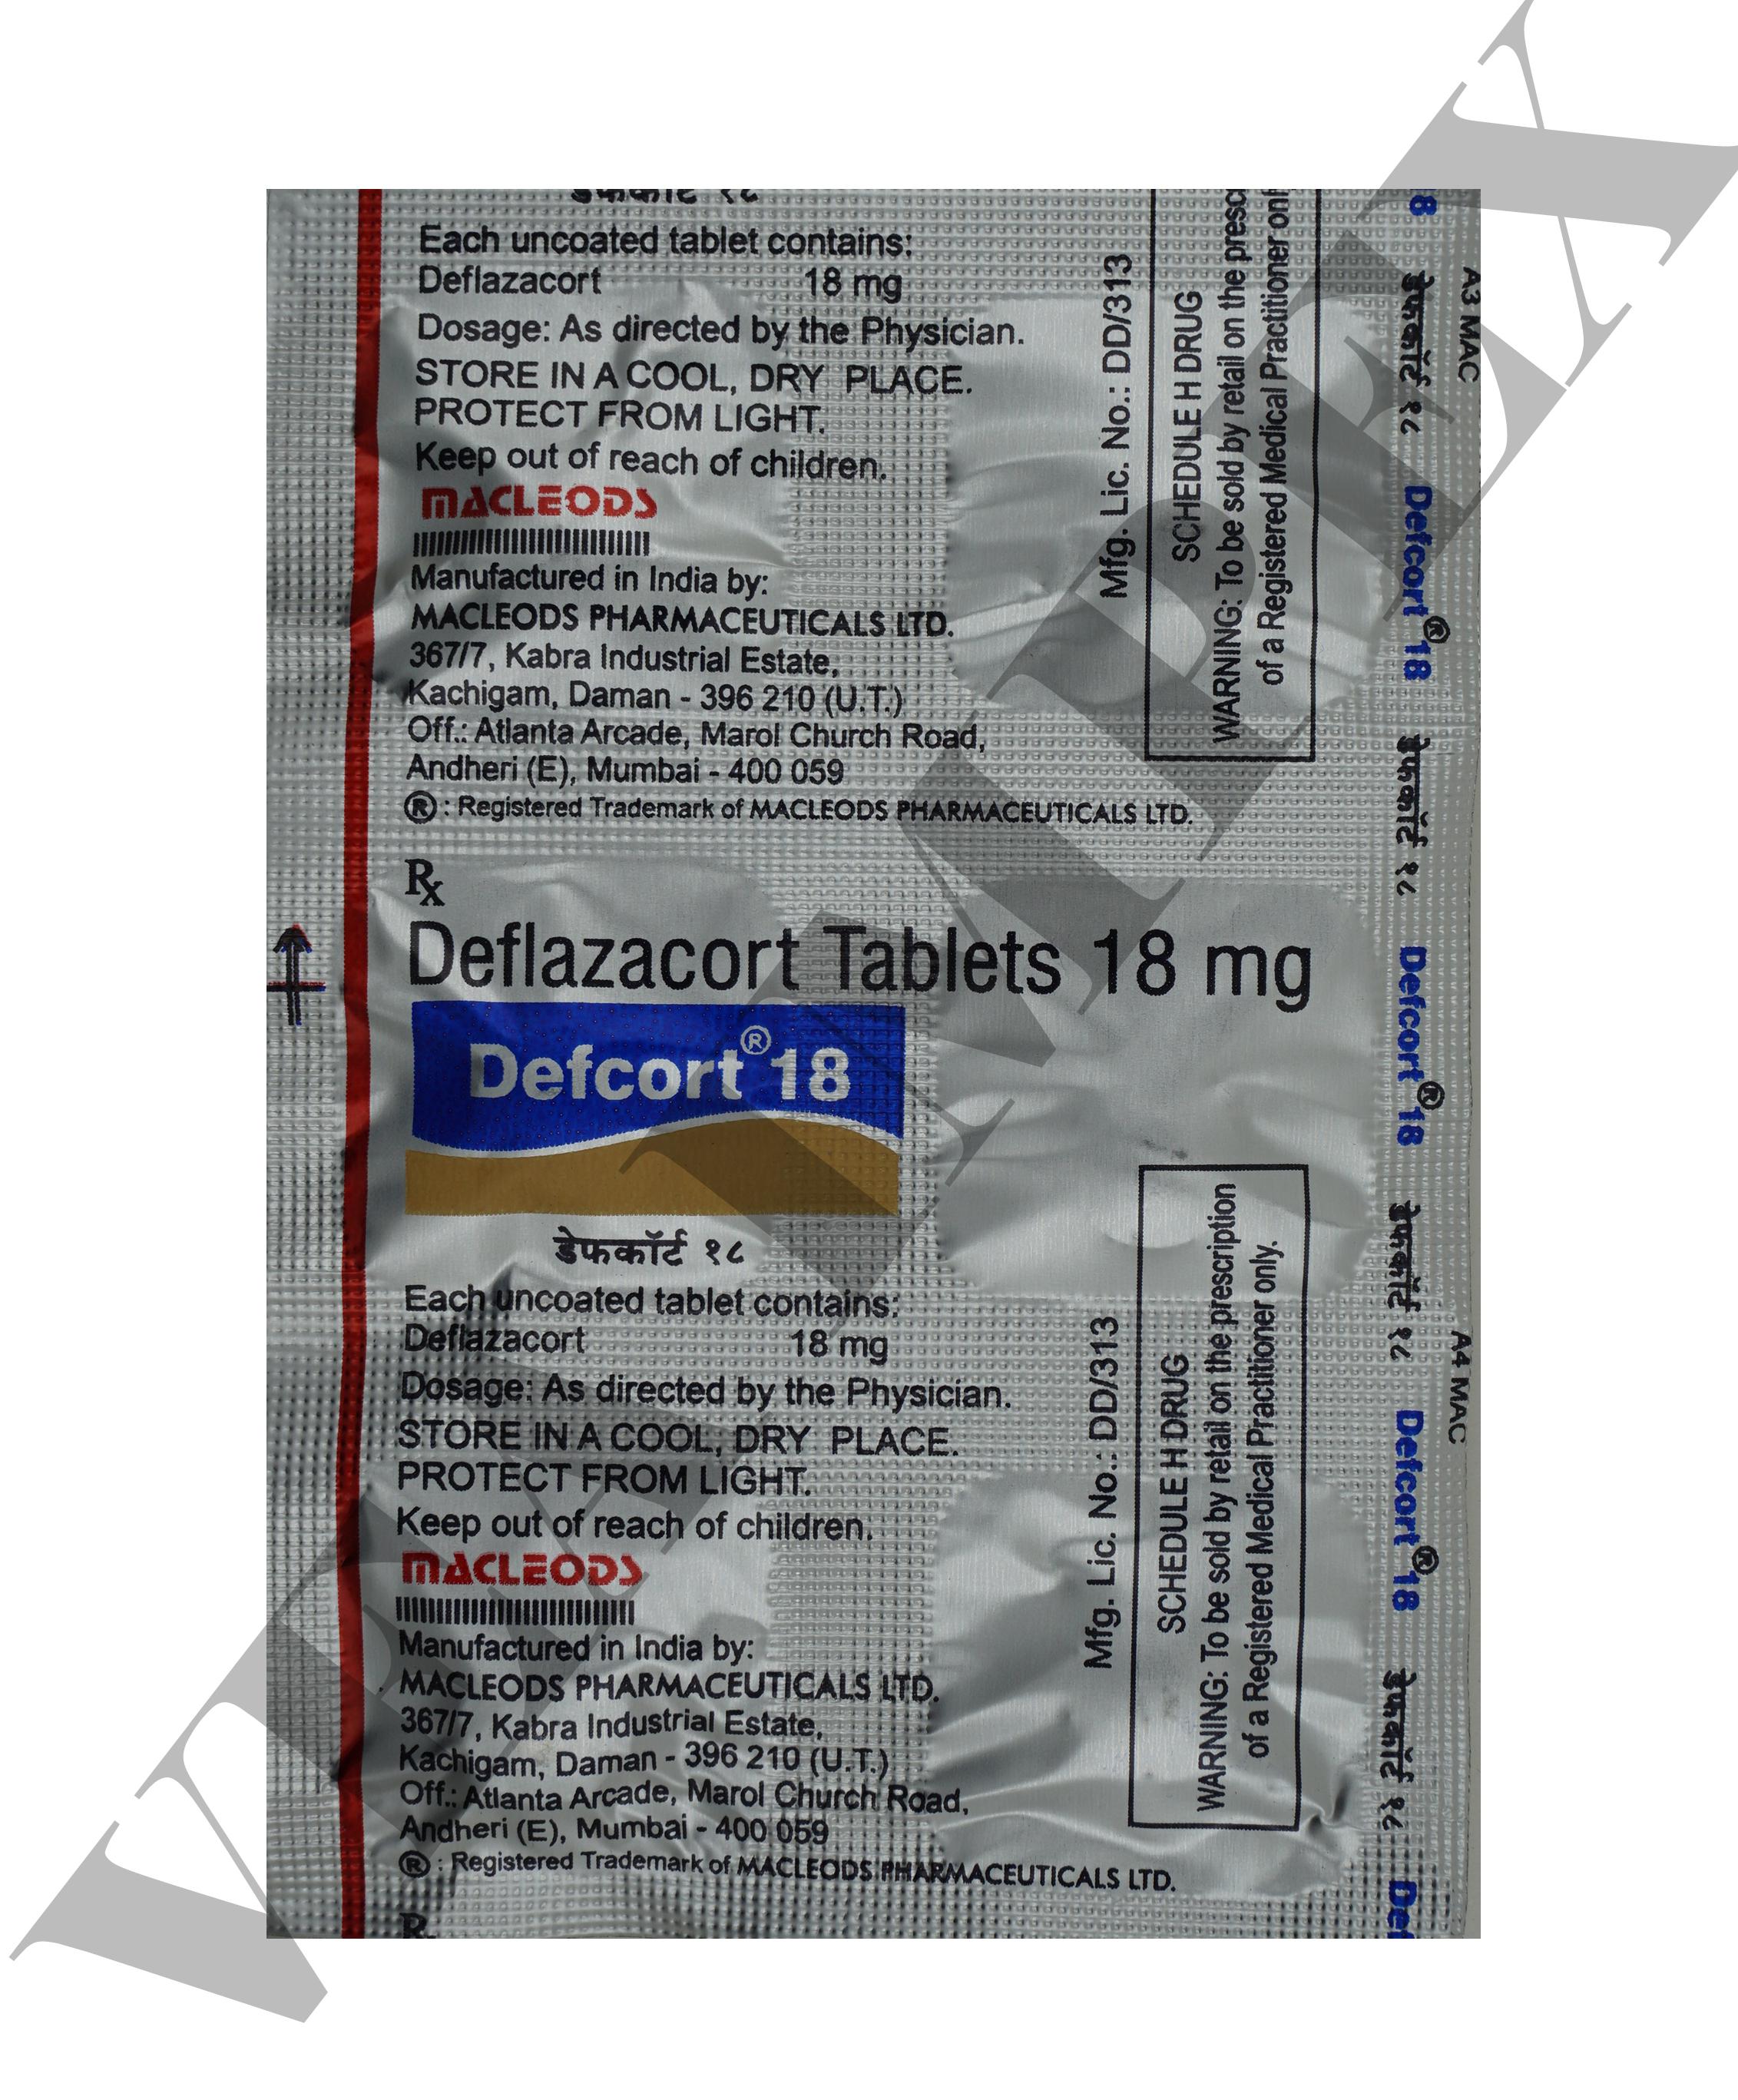 Defcort 18 mg Tablets